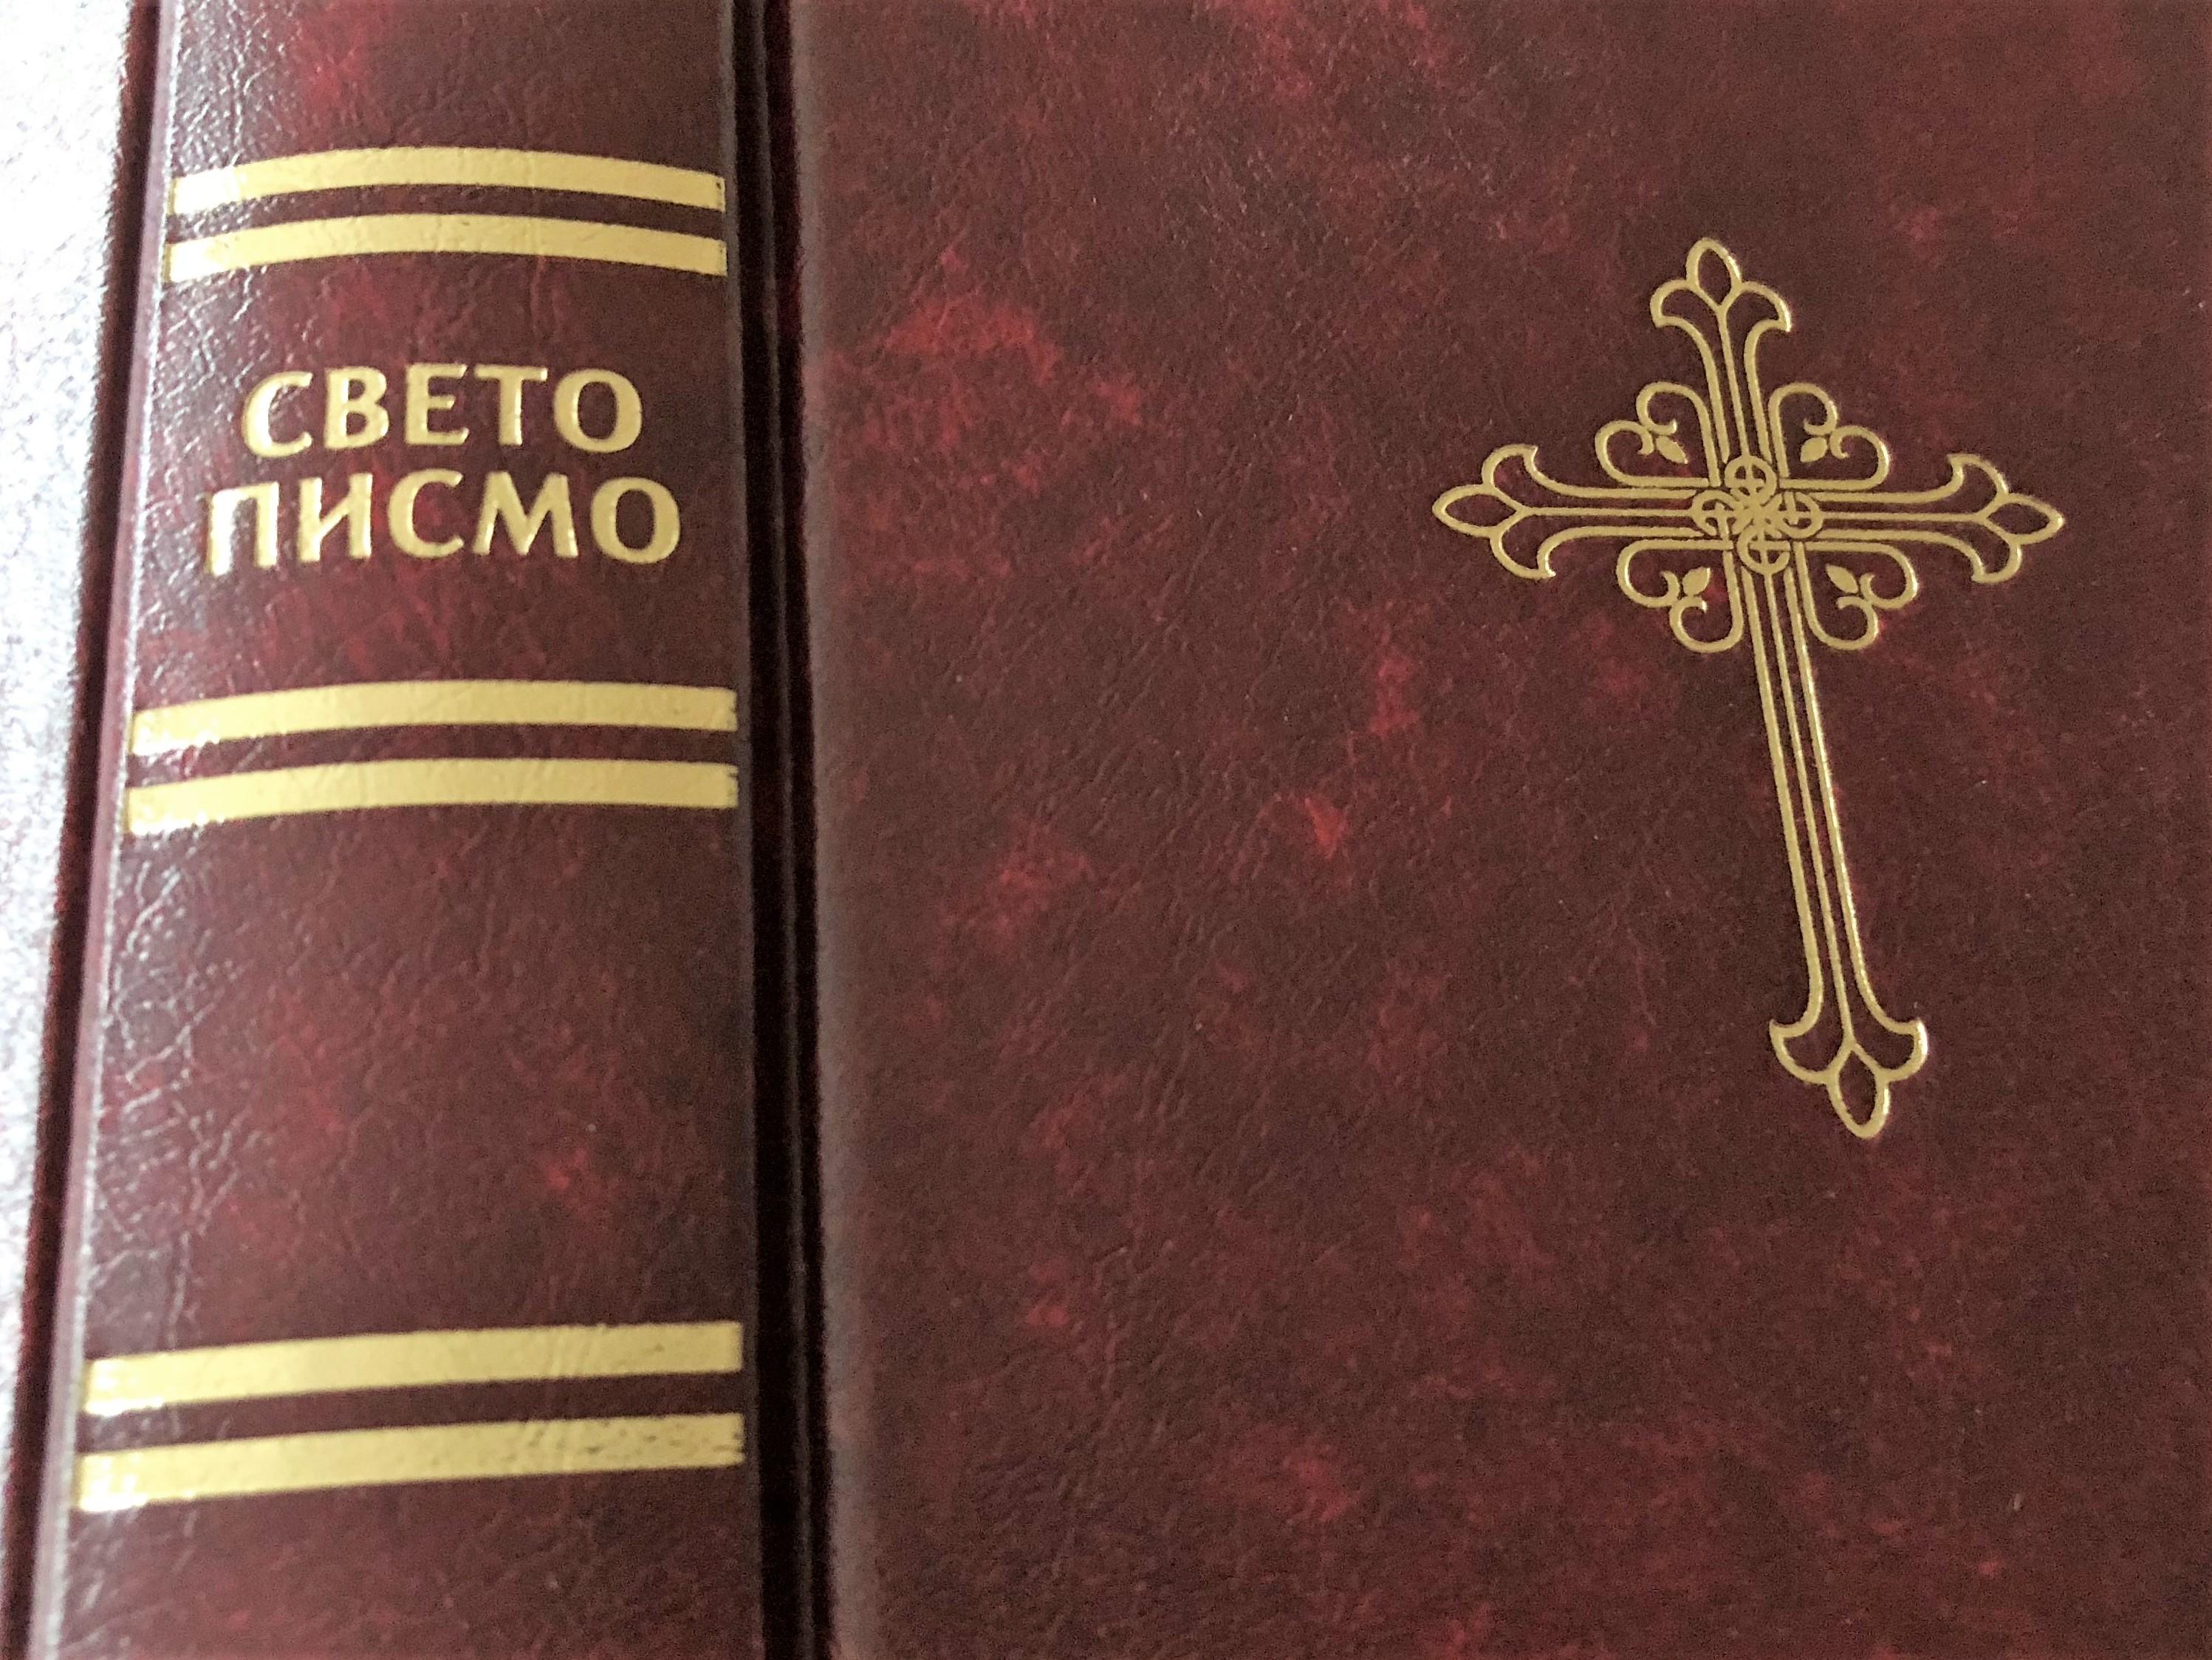 serbian-language-bible-burgundy-cover-with-golden-cross-cyrillic-script-043hs-s-7-.jpg